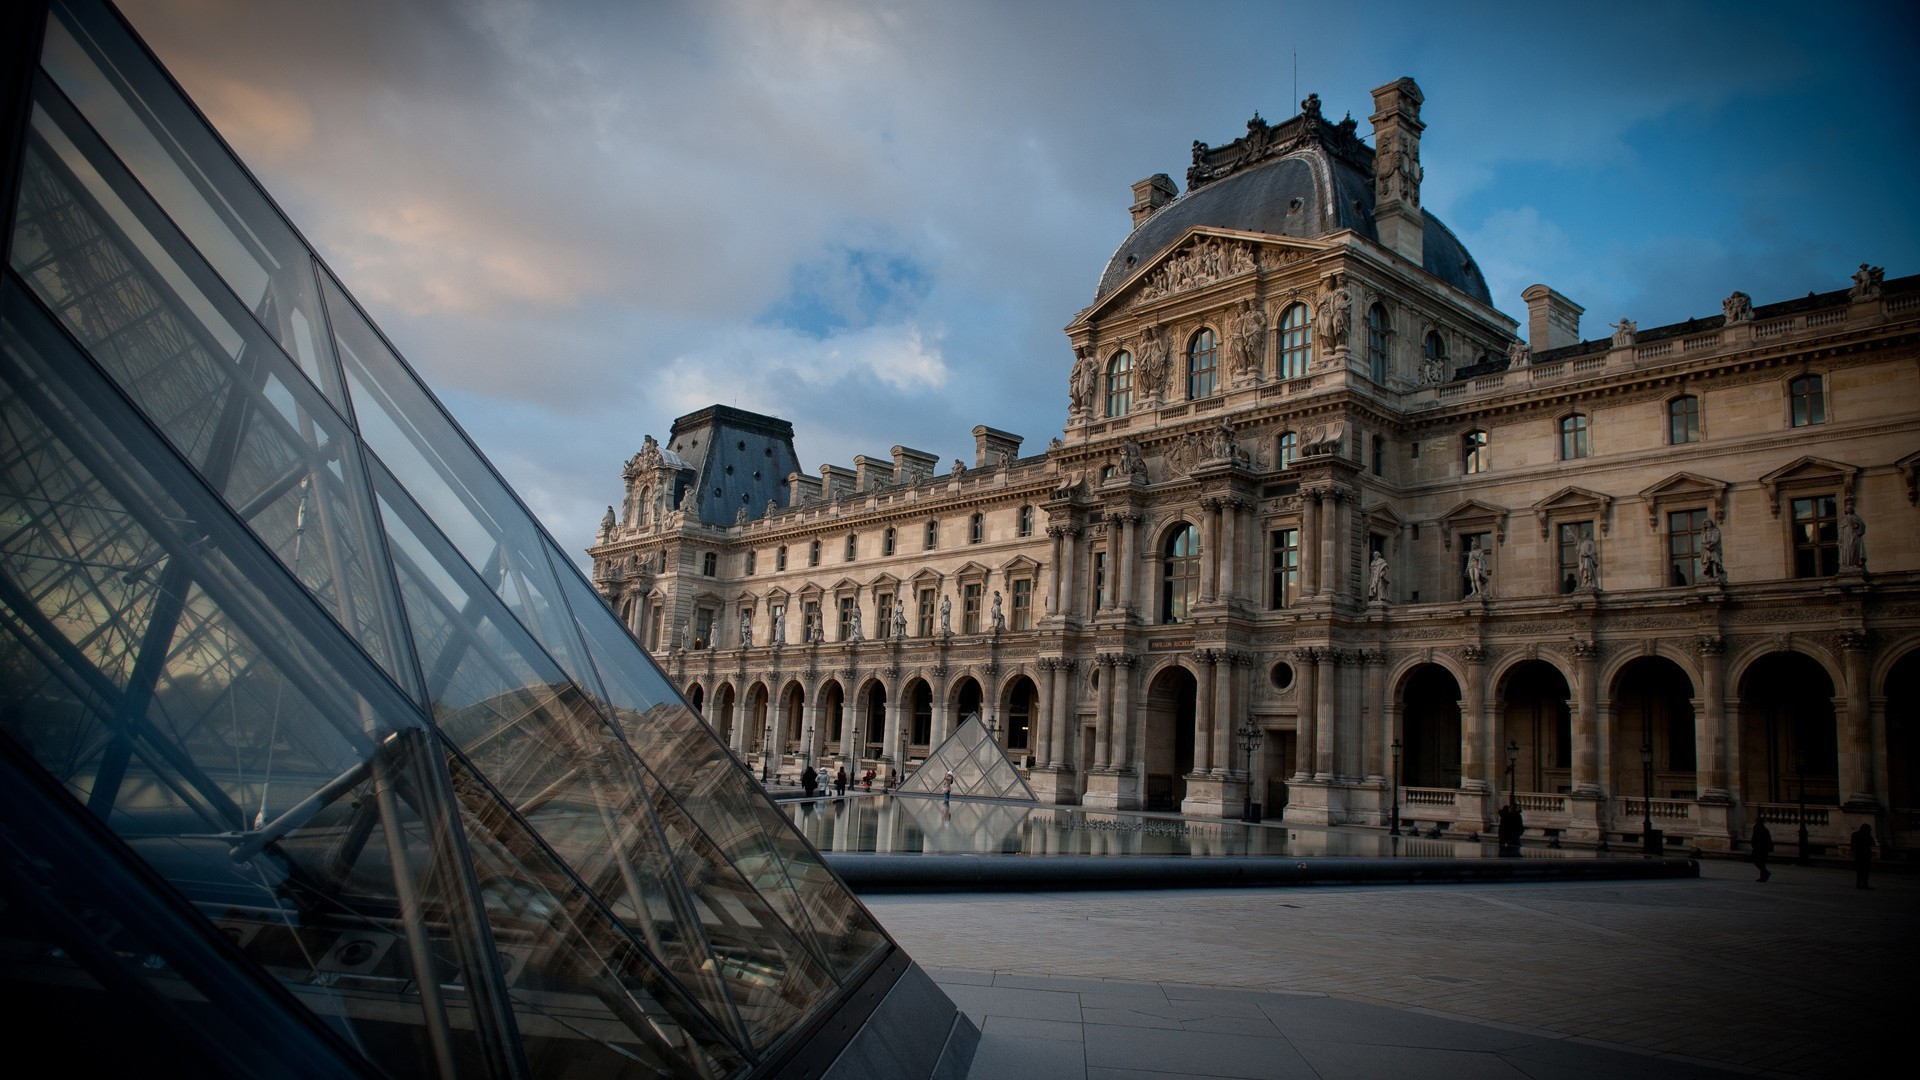 3d Hd Wallpapers For Laptop 1366x768 Building Paris The Louvre Wallpapers Hd Desktop And